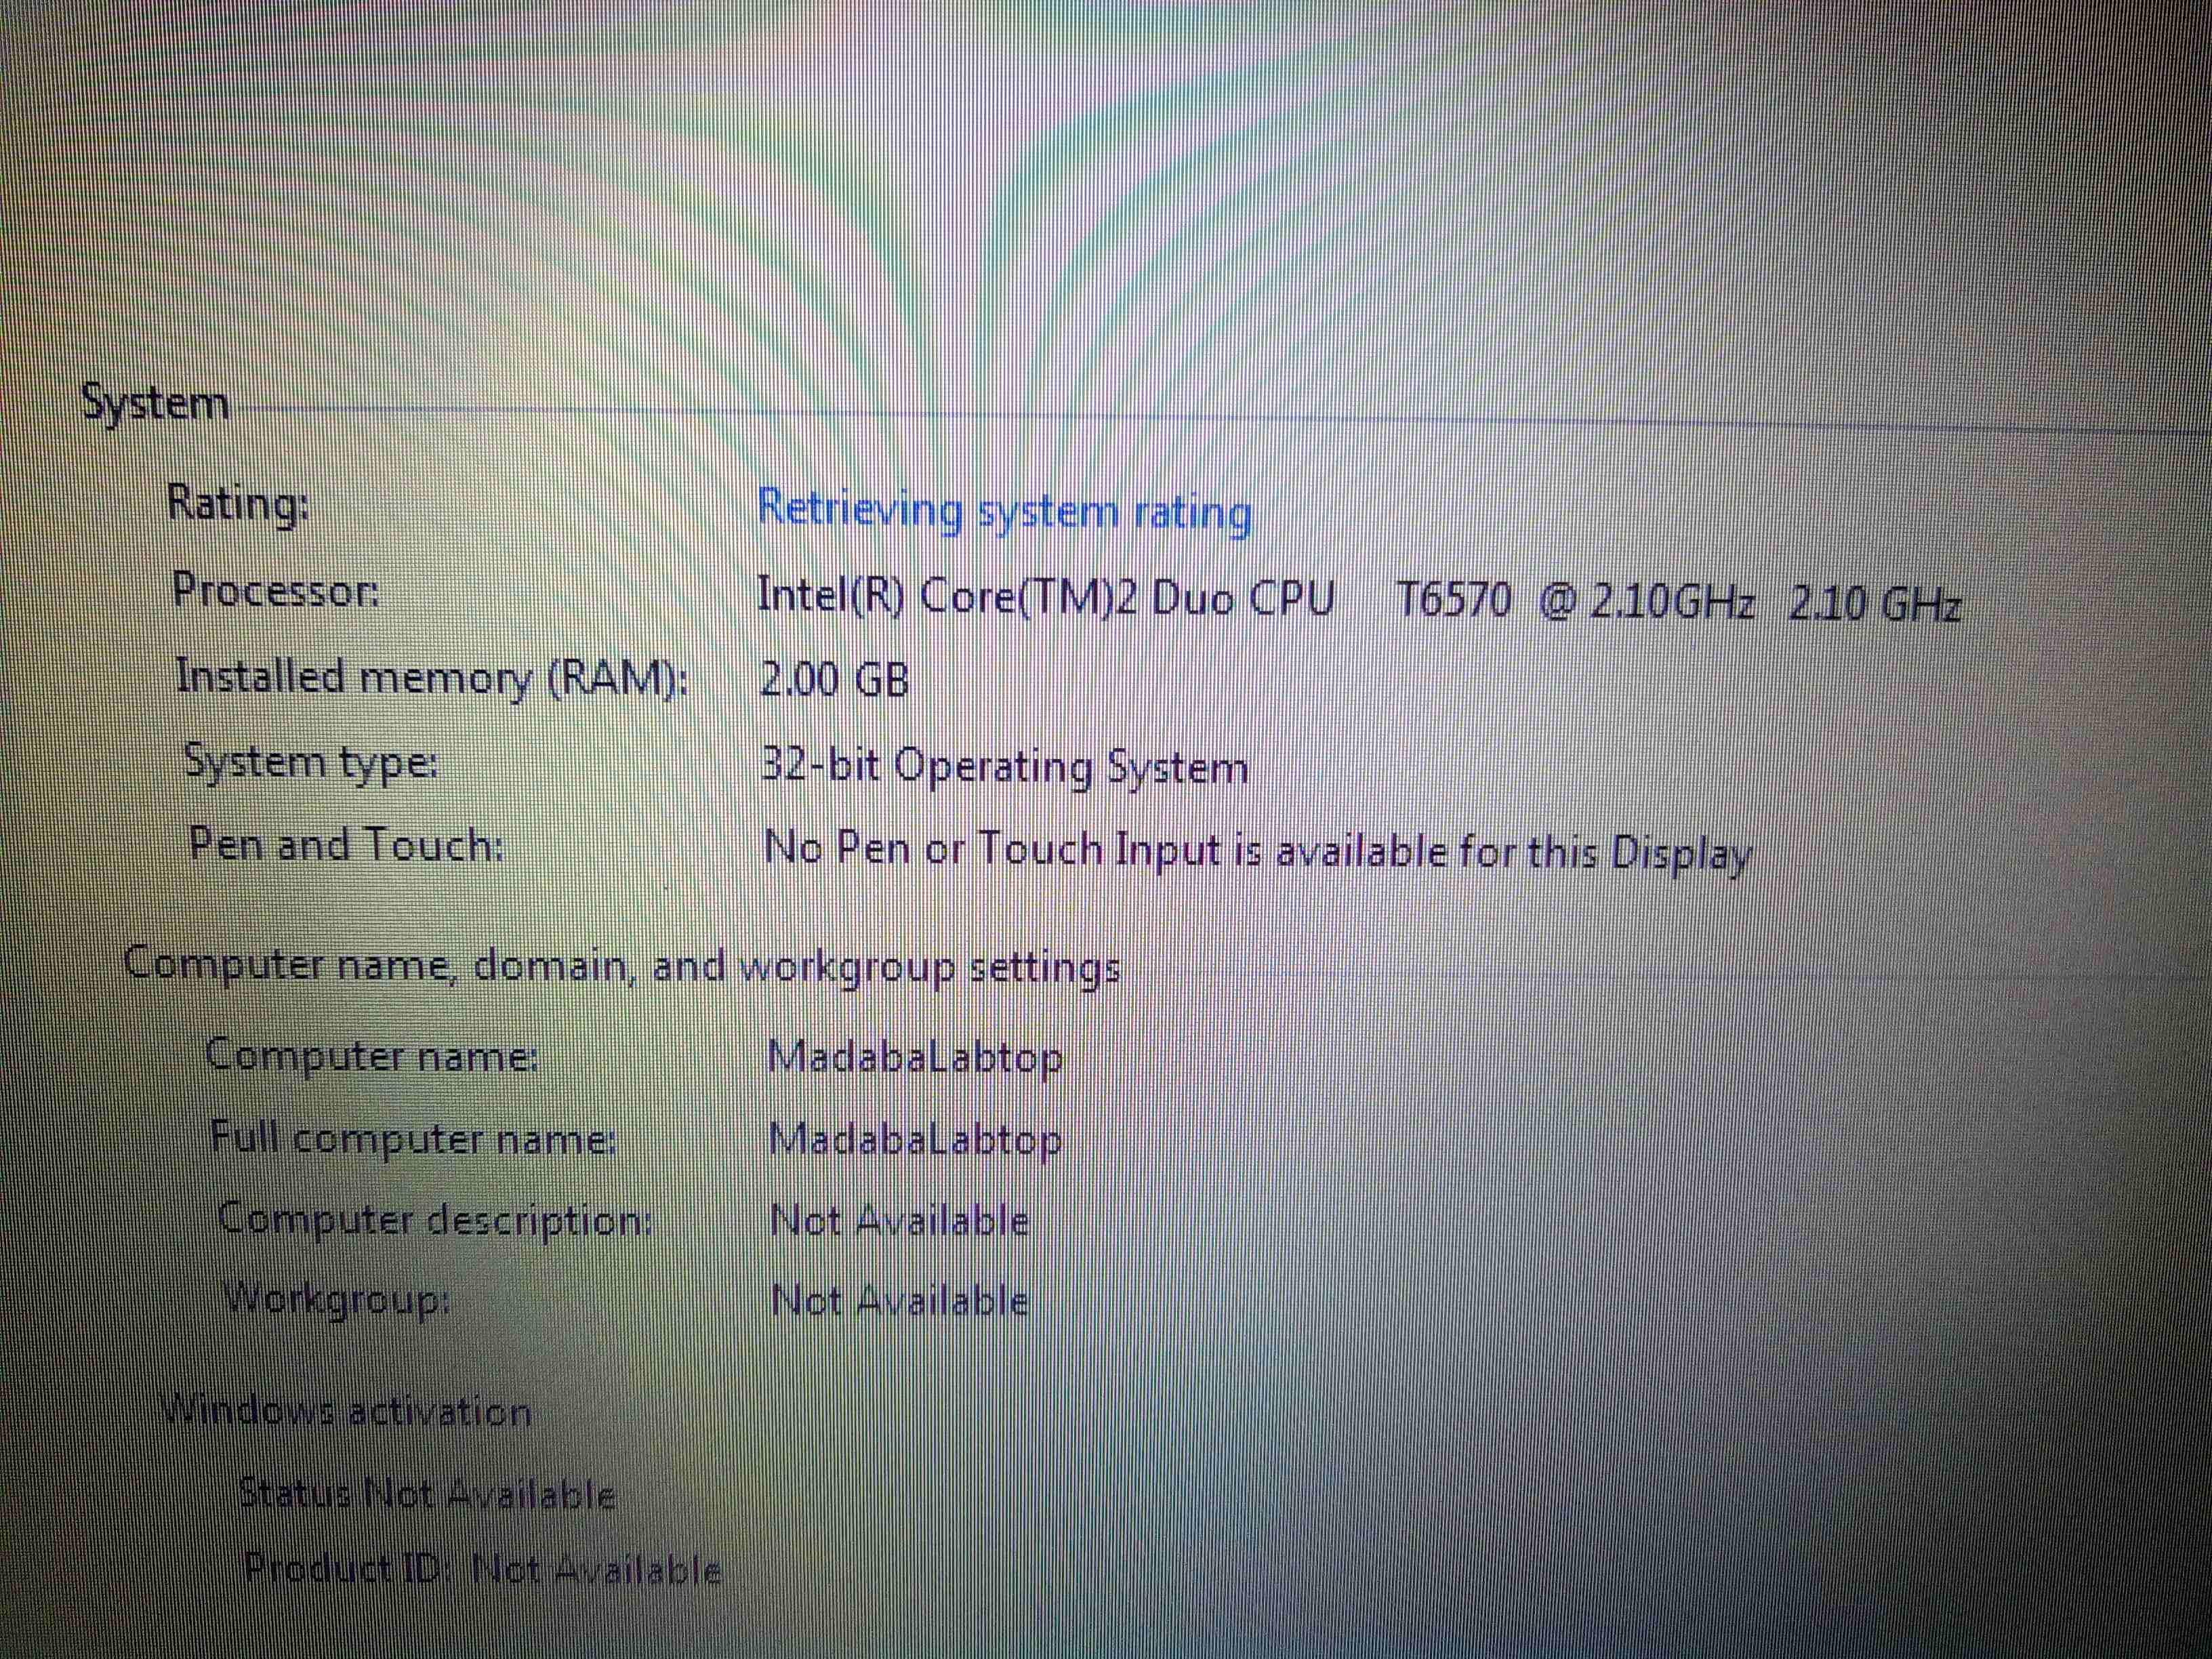 ASUS Transformer Book T100 detachable laptop 2in1 windows 10 like new-  HP PRO BOOK بحال الوكالة...